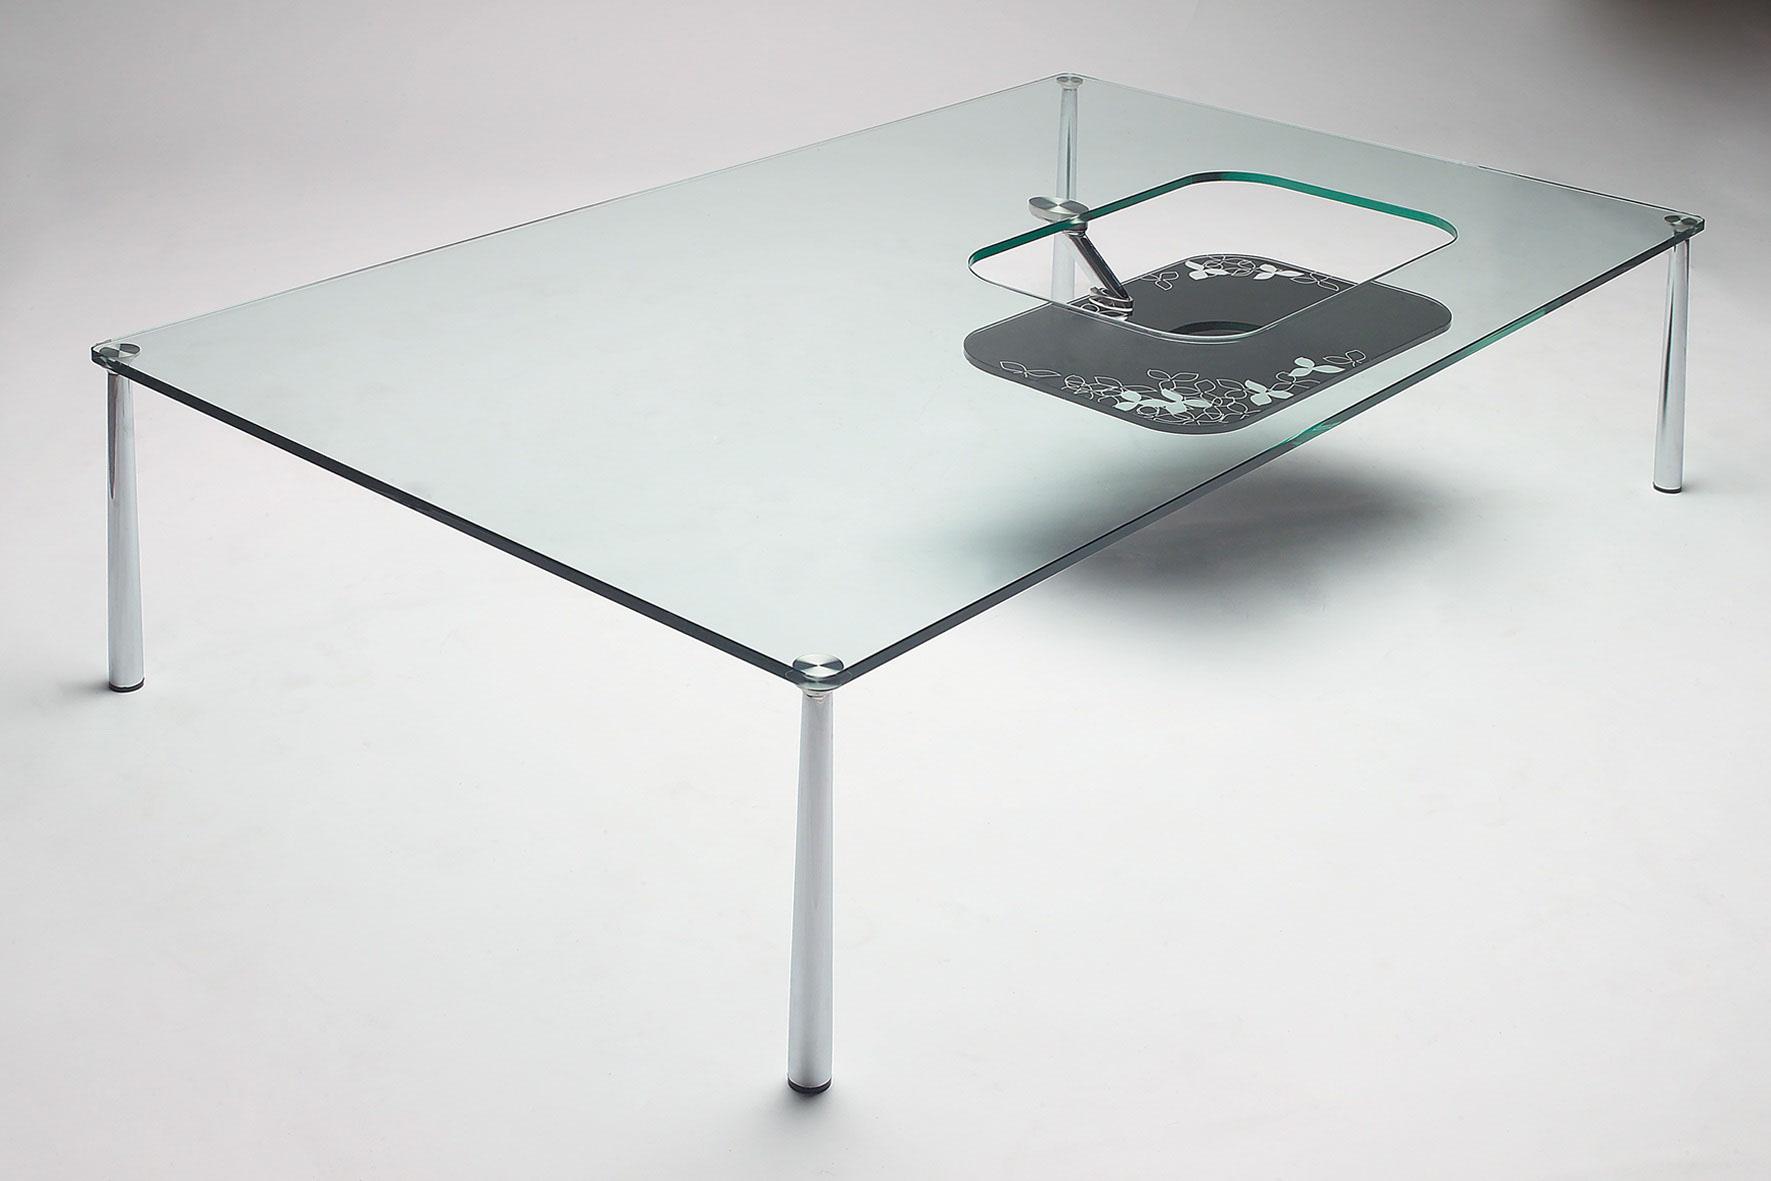 Peachy Custom Glass Table Top Supplier Denver Denver Glass Download Free Architecture Designs Sospemadebymaigaardcom